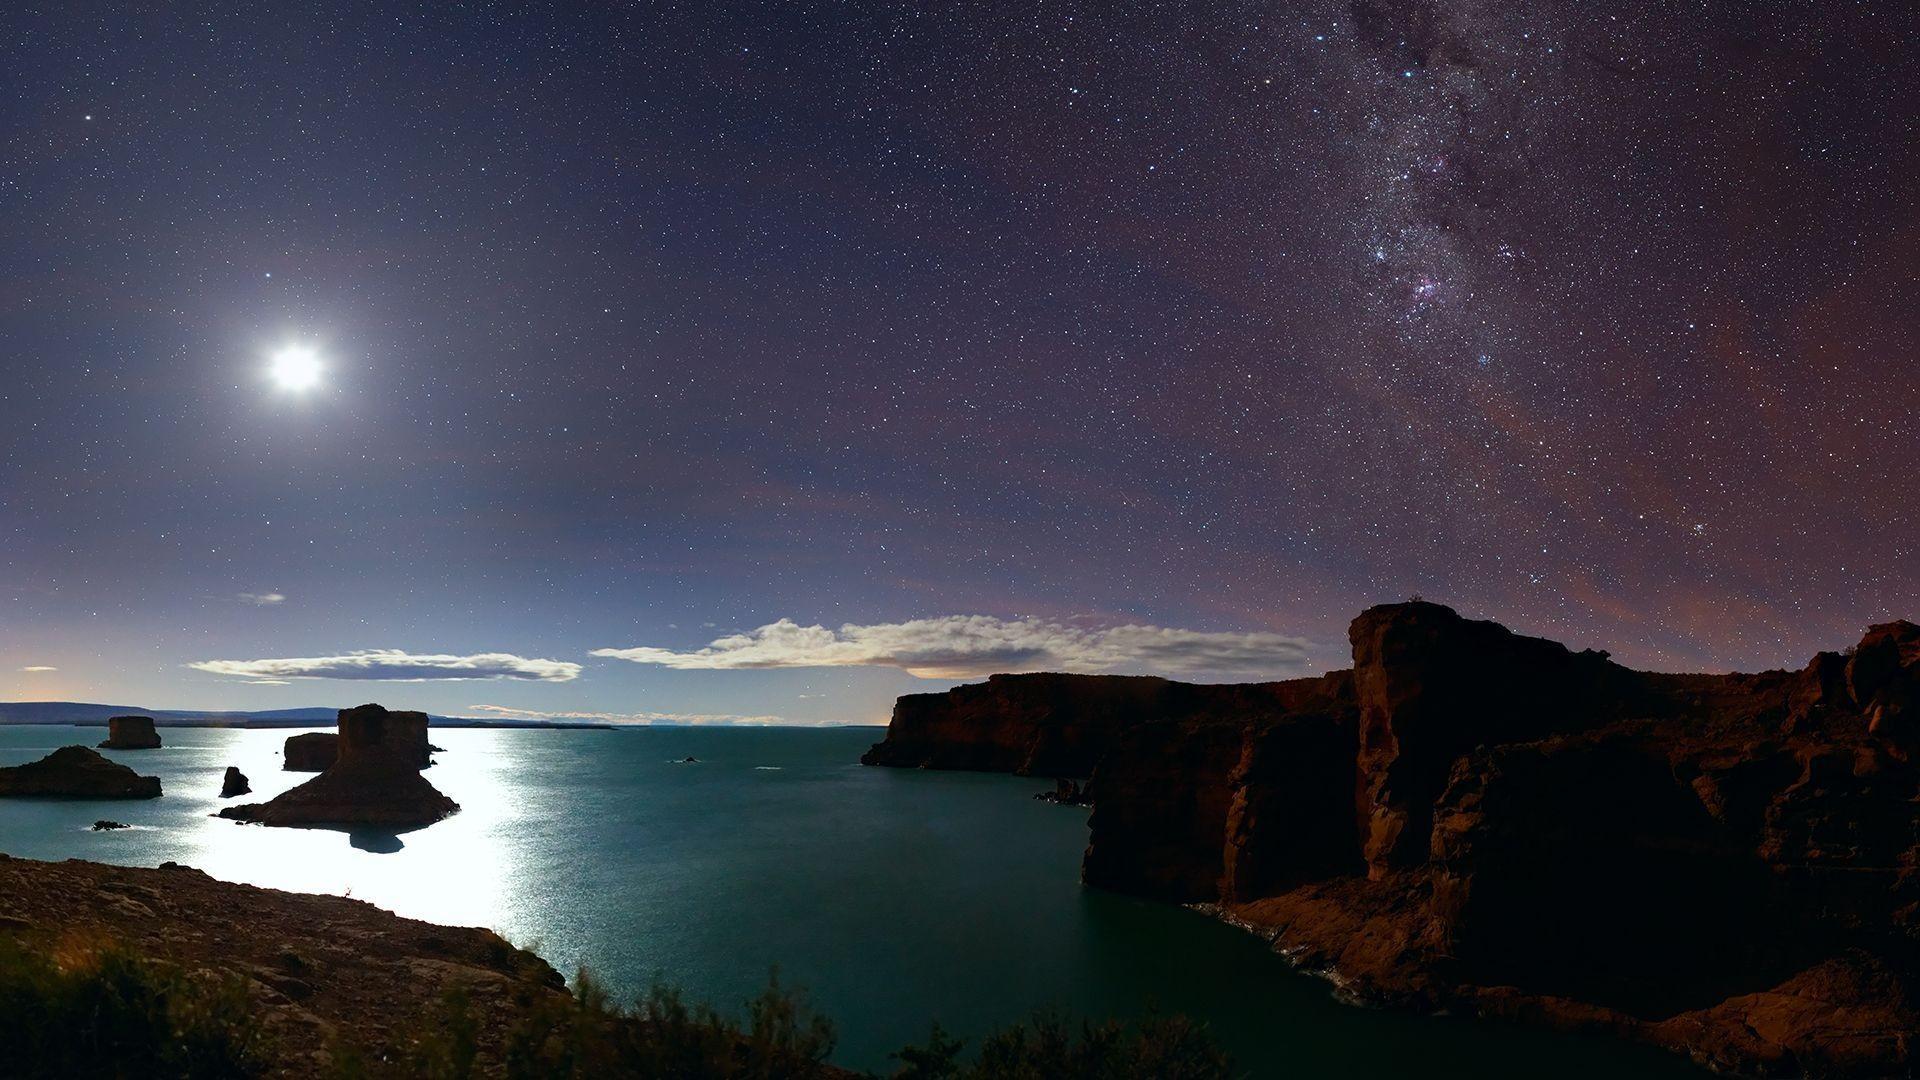 Top Starry Sky Ocean Images for Pinterest